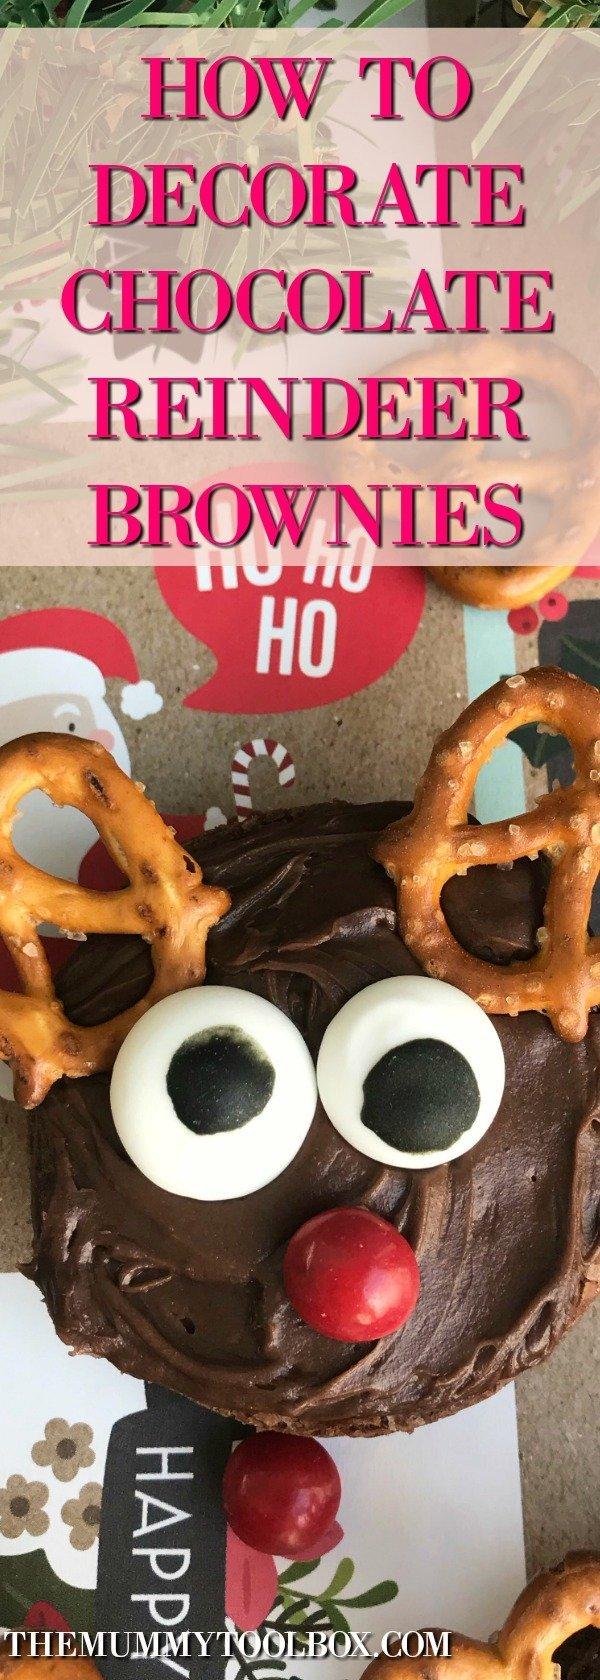 decorating reindeer brownies for festive fun with the kids. #christmasfood #christmas #treats #kidsactivities